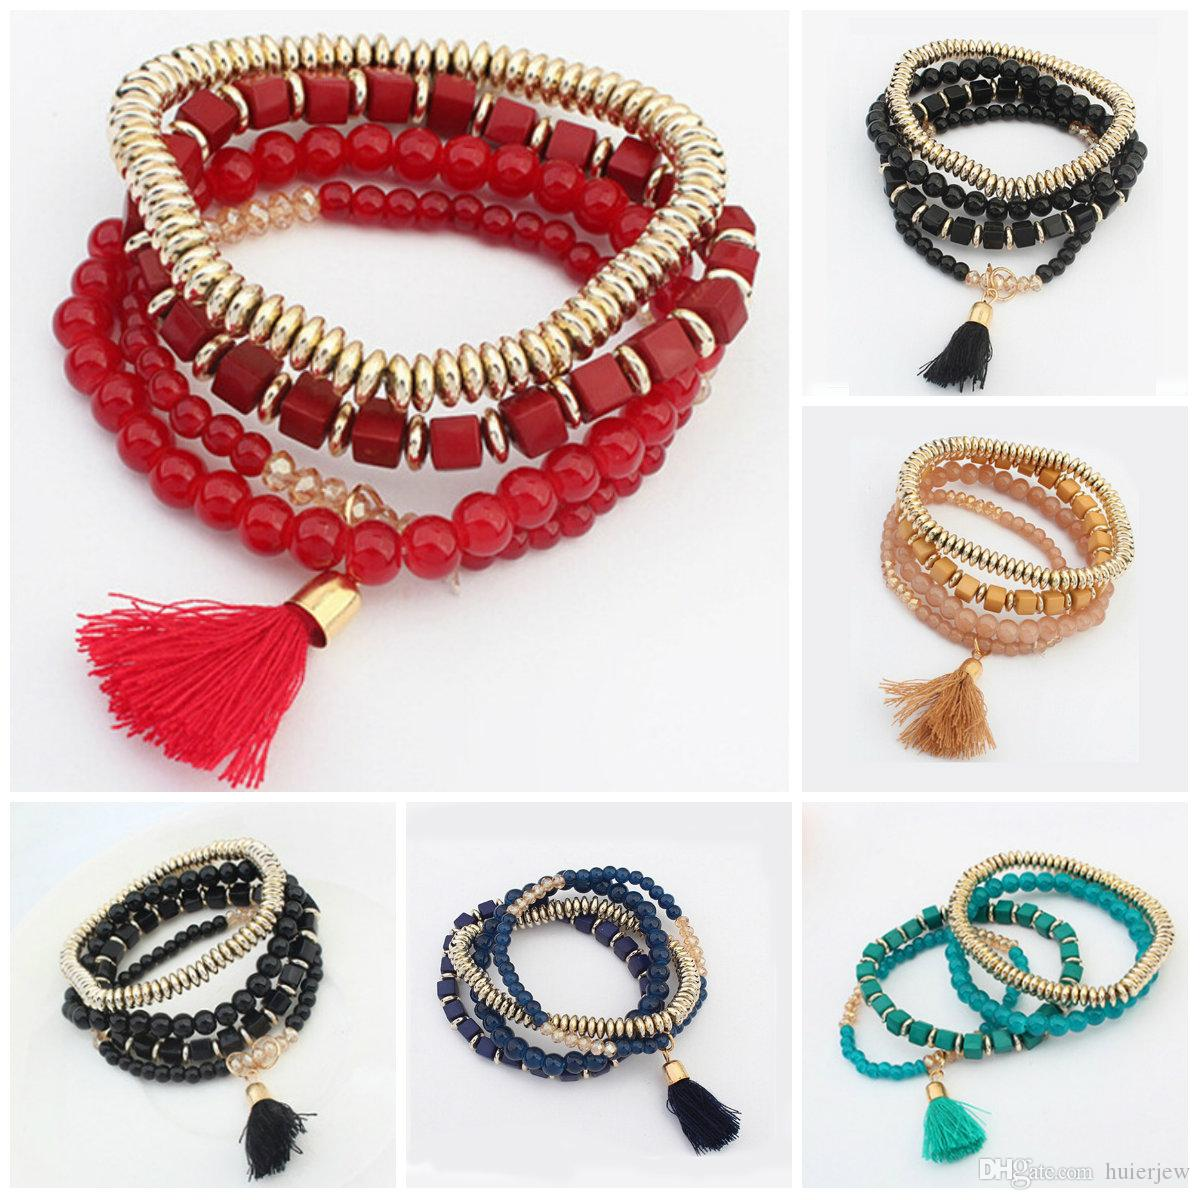 bf2966060b Cheap One Direction Wristband Bracelets Wholesale Pearl Band Bracelet